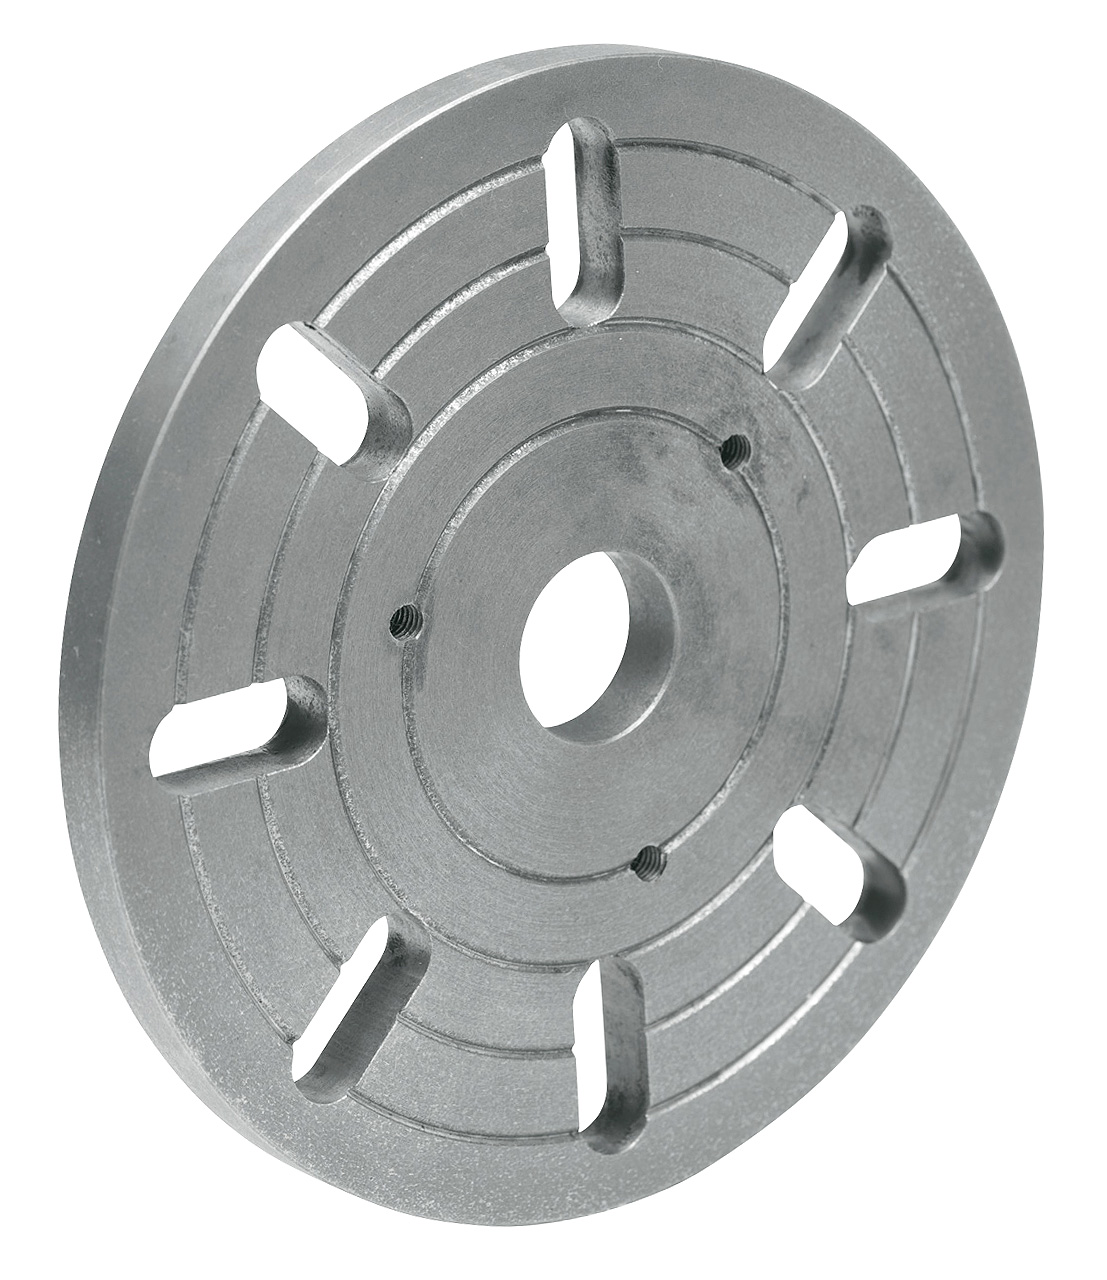 Tarcza czołowa 160 mm do Hobby 300 / 400 (Super) / 350 VD BERNARDO